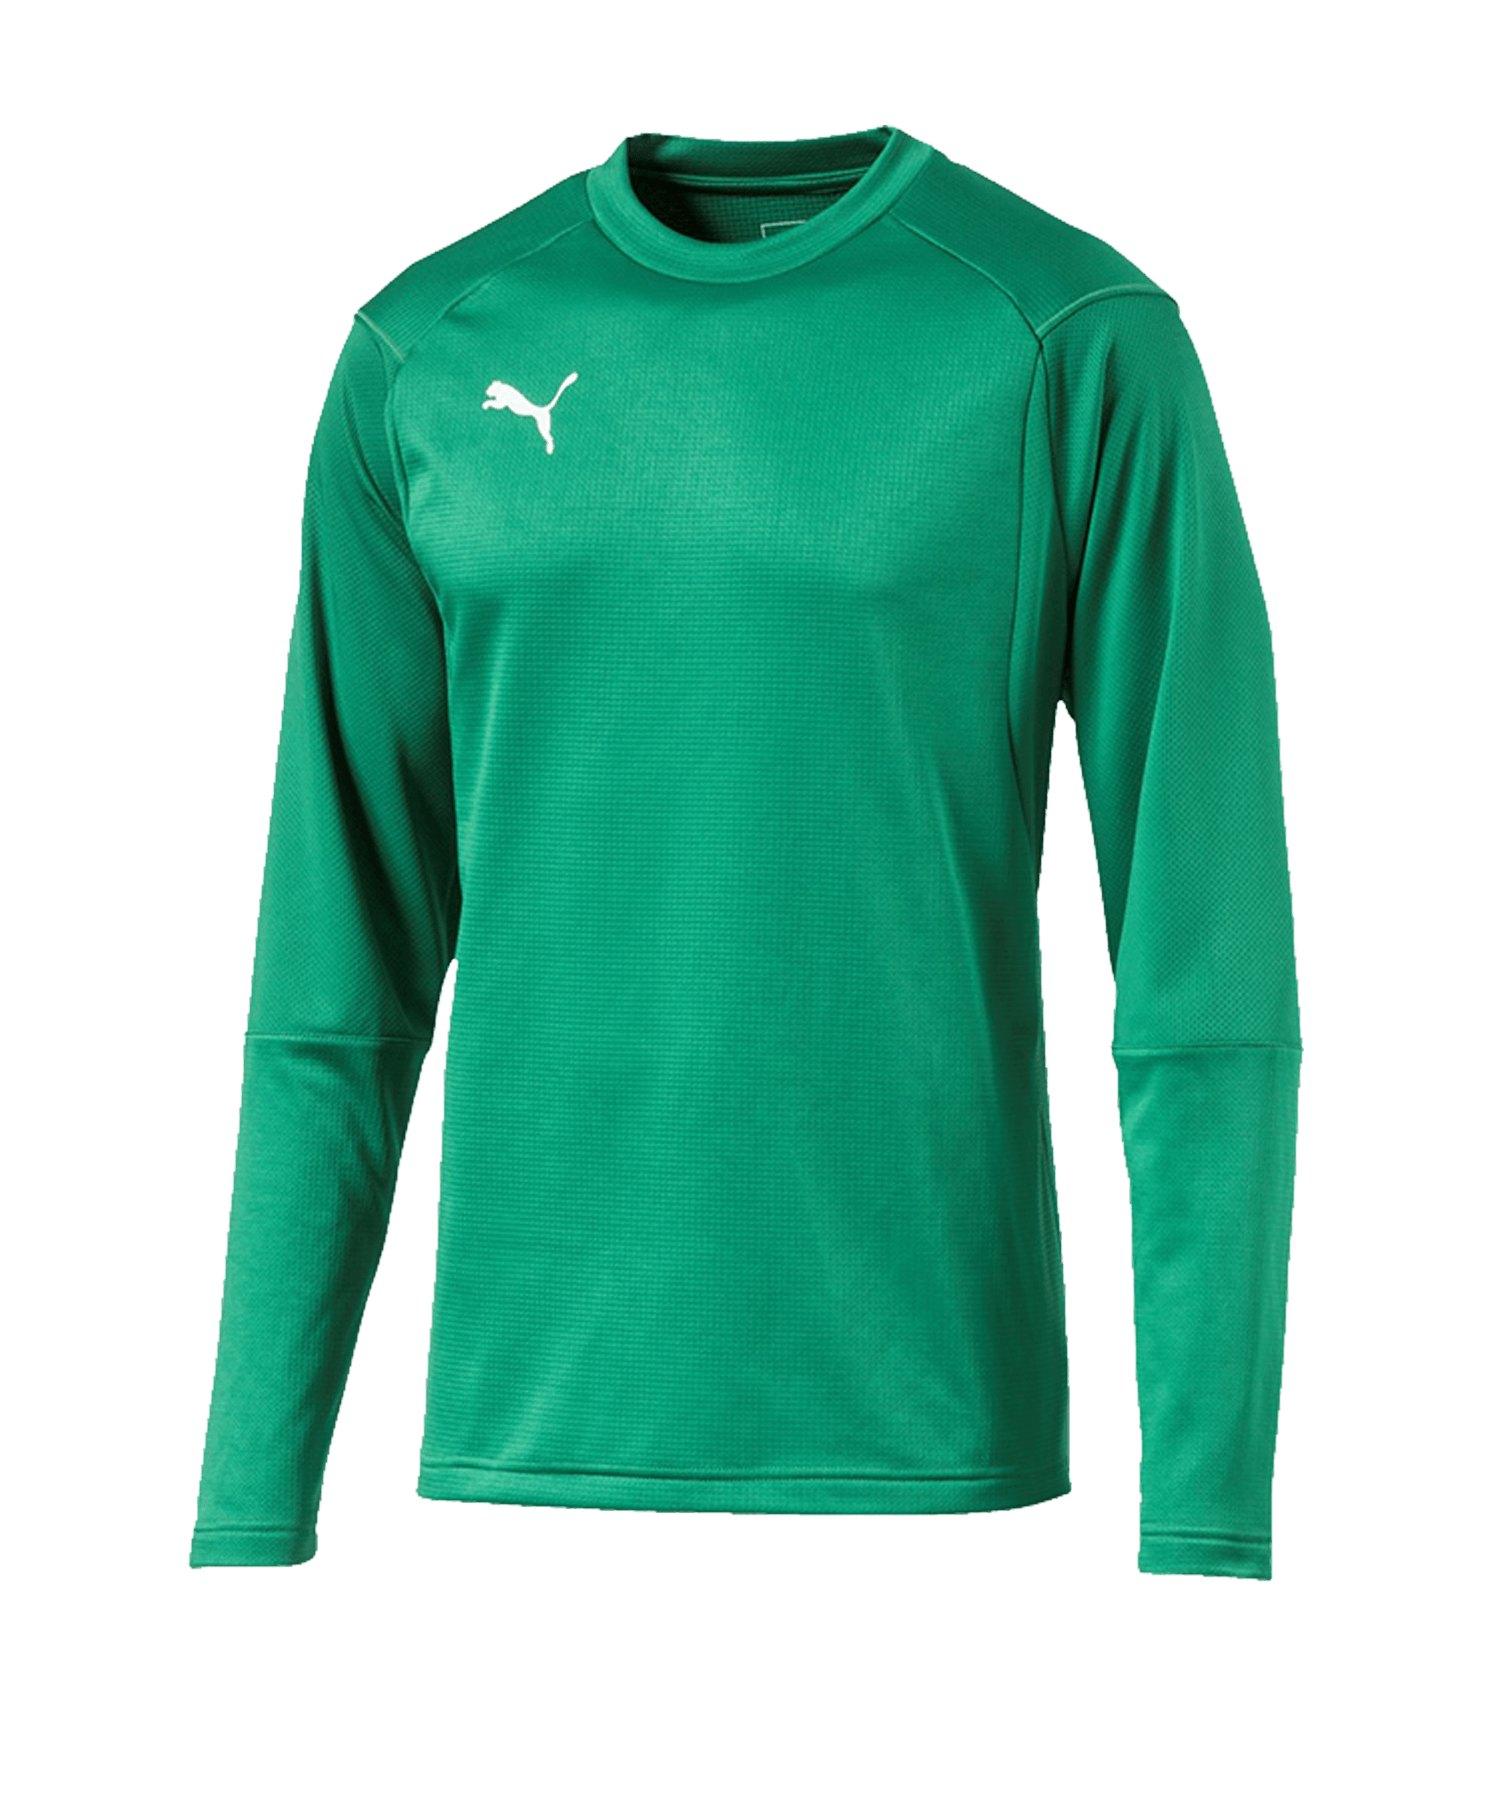 PUMA LIGA Training Sweatshirt Grün F05 - gruen